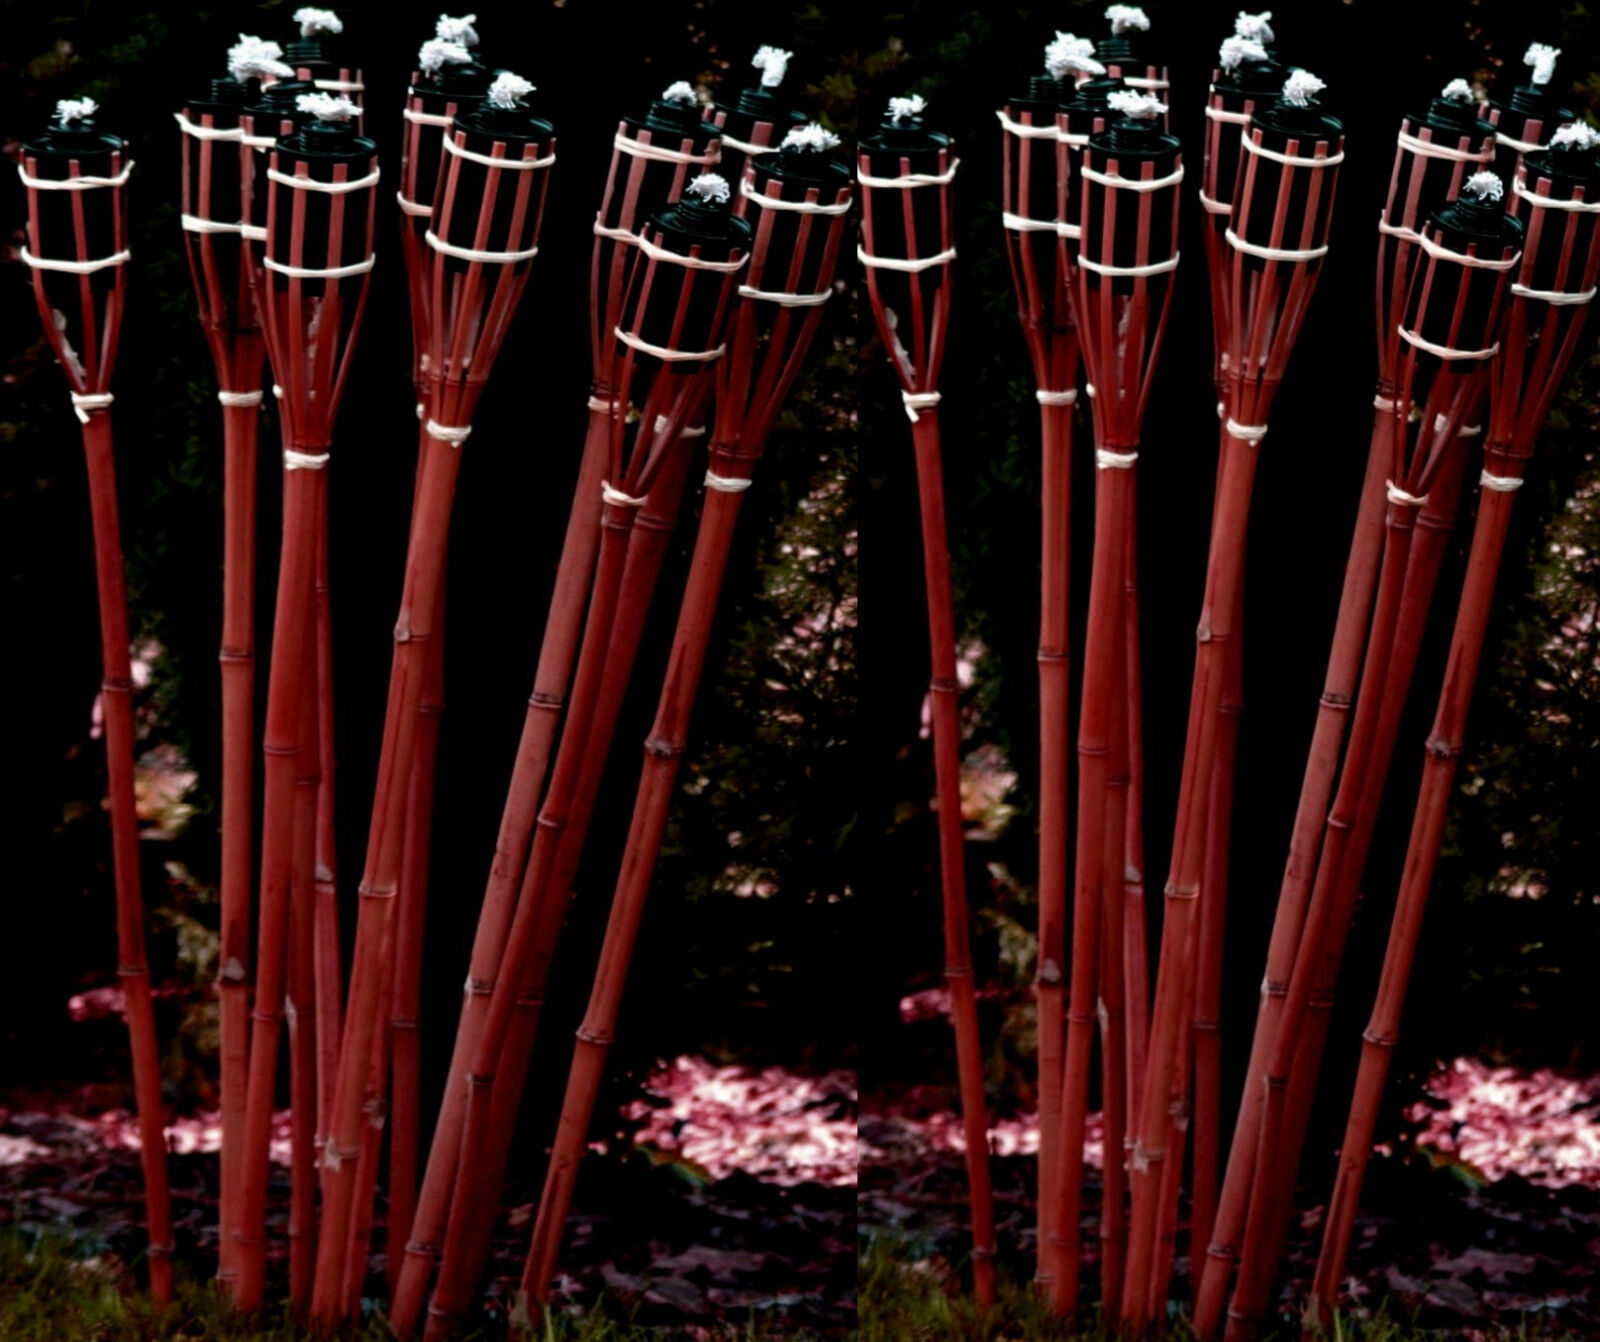 12 Stk Bambusfackeln 120 cm ROTBRAUN Gartenfackel Bambus Fackel Garten Deko